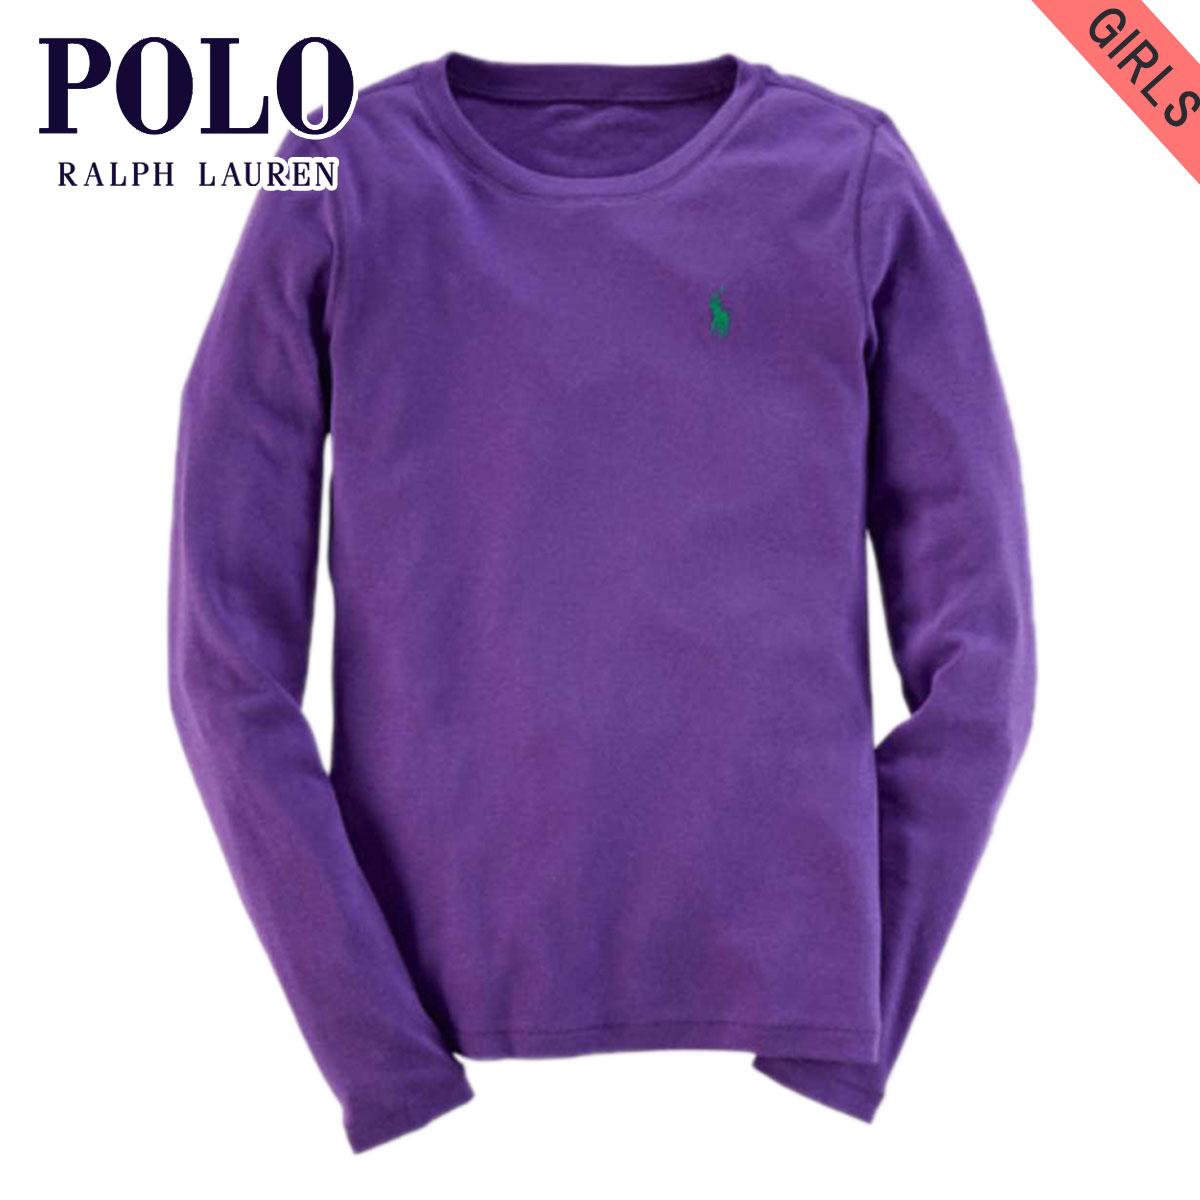 687a6af51734 Poloralflorenkids POLO RALPH LAUREN CHILDREN genuine kids clothes girls  long sleeve T shirt COTTON LONG-SLEEVED TEE 40925556